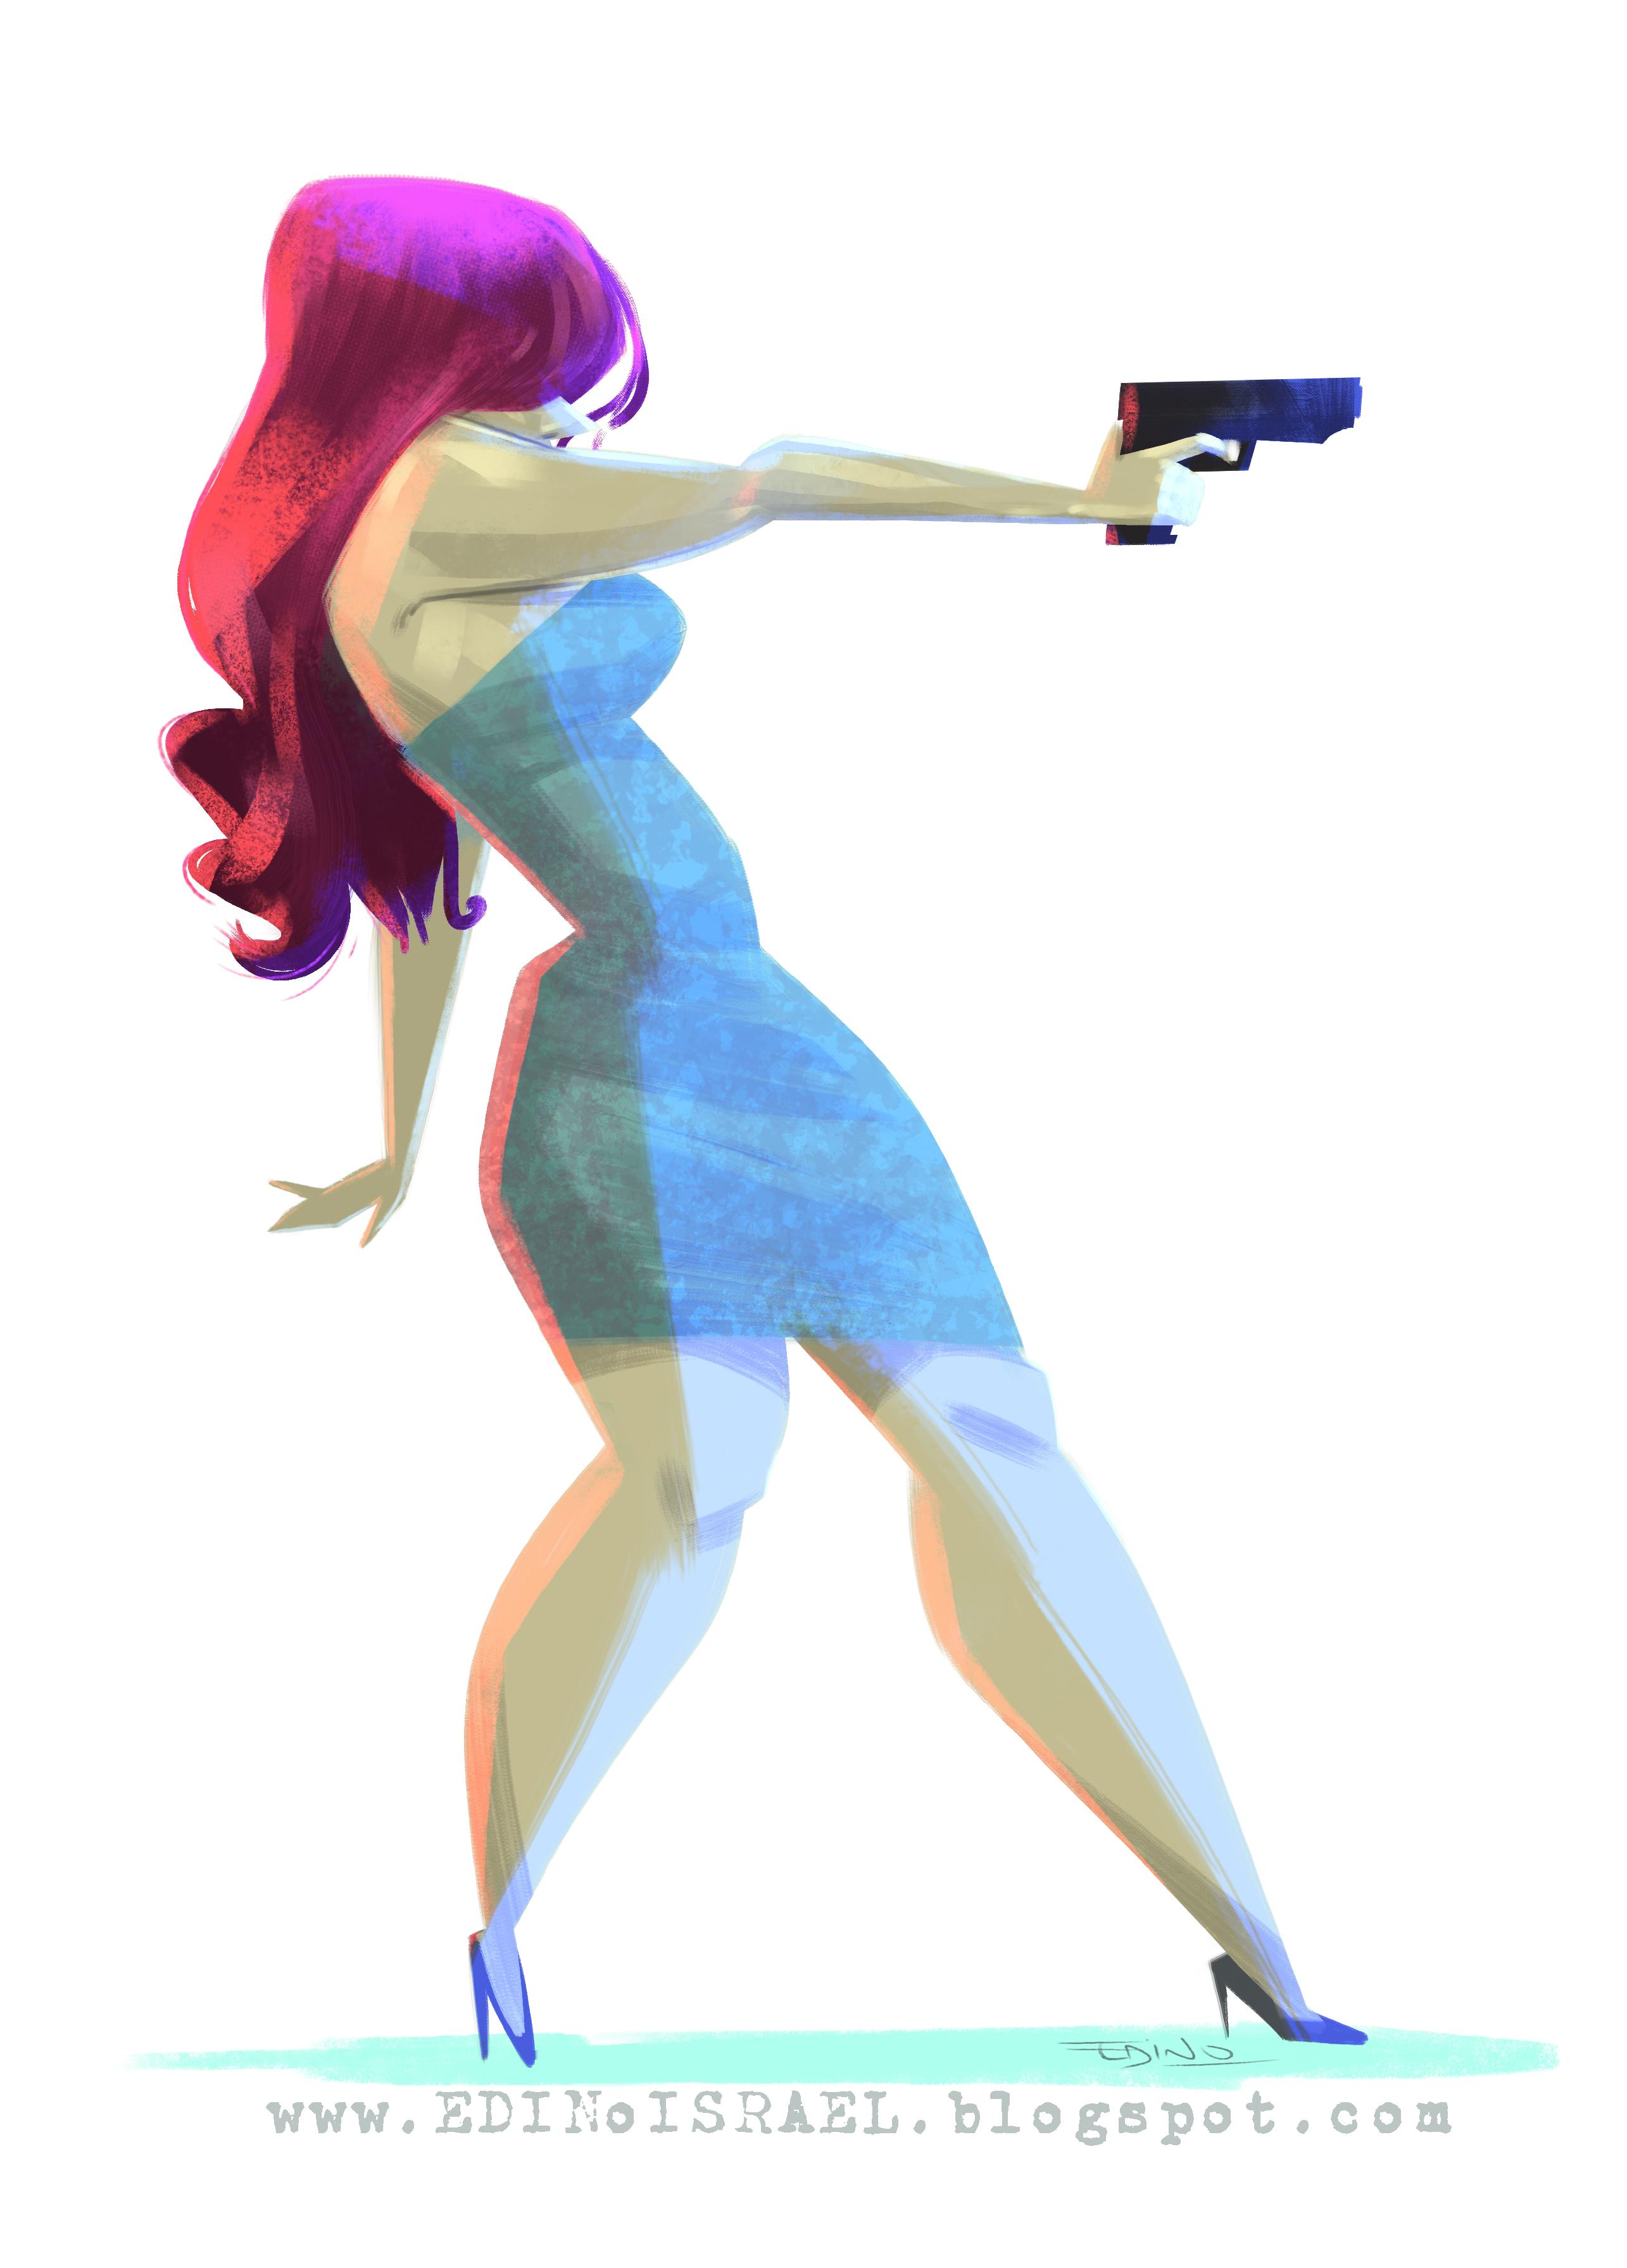 chica disparando character